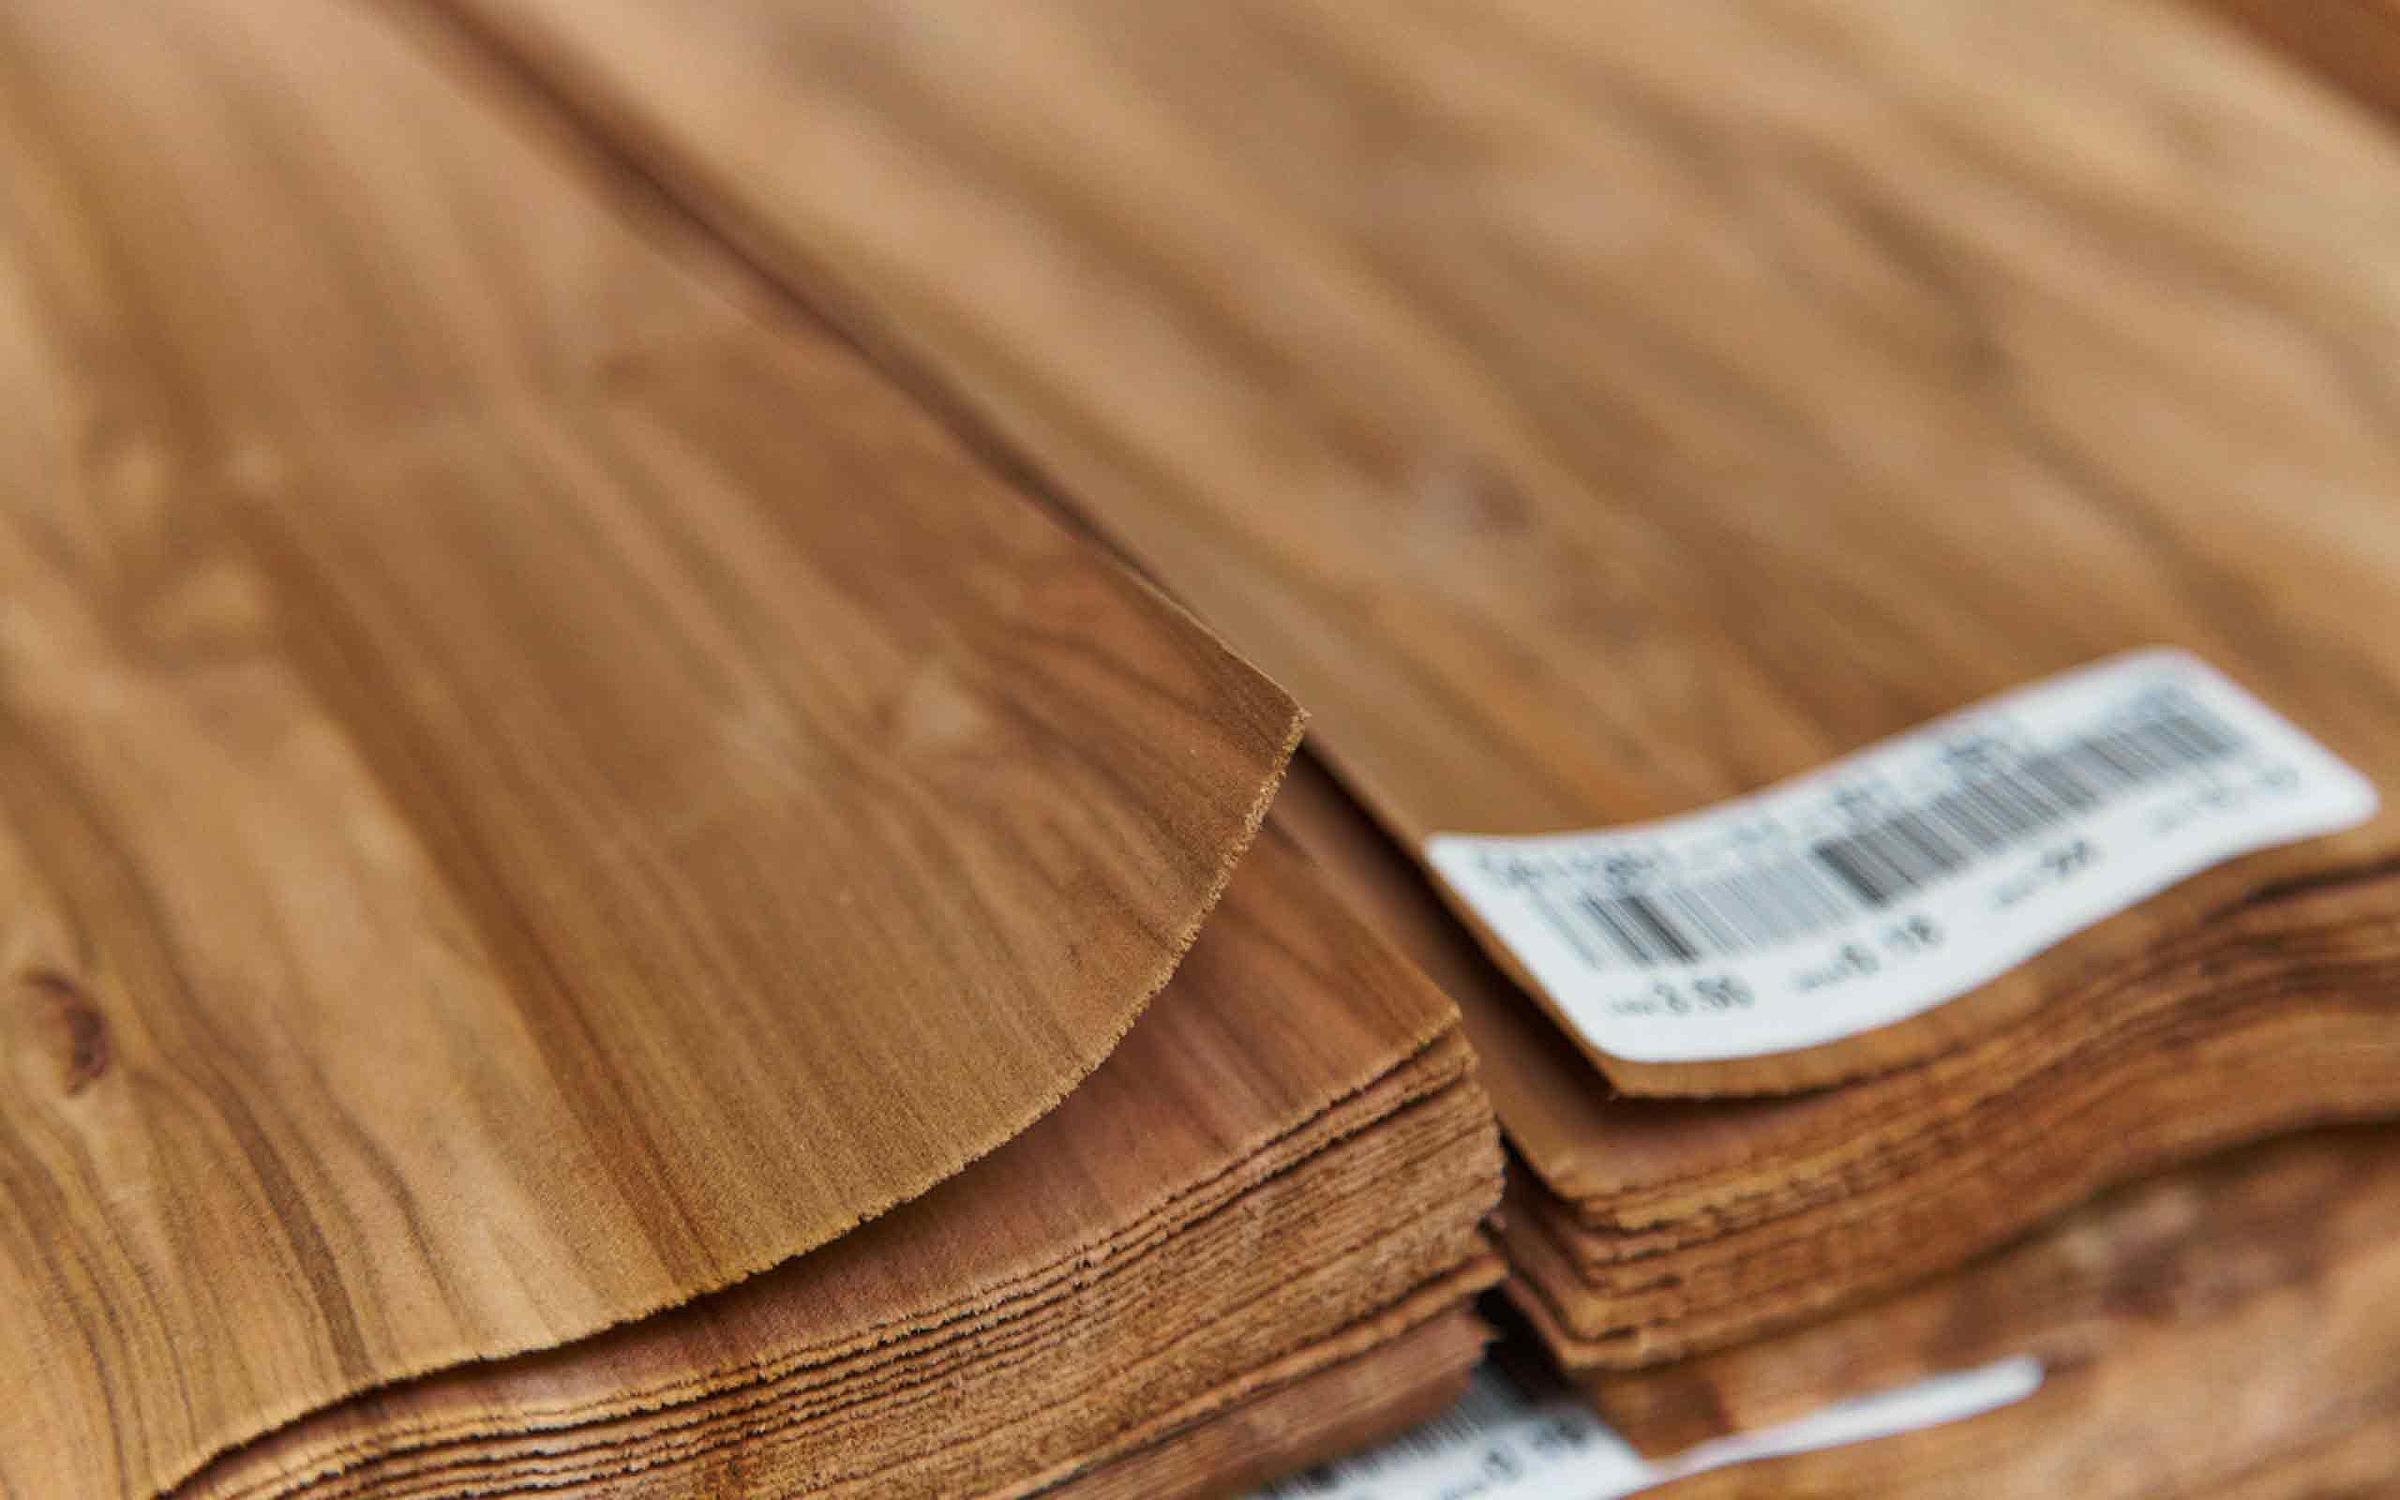 RMW Holz Furnier Massiv Qualitätskontrolle